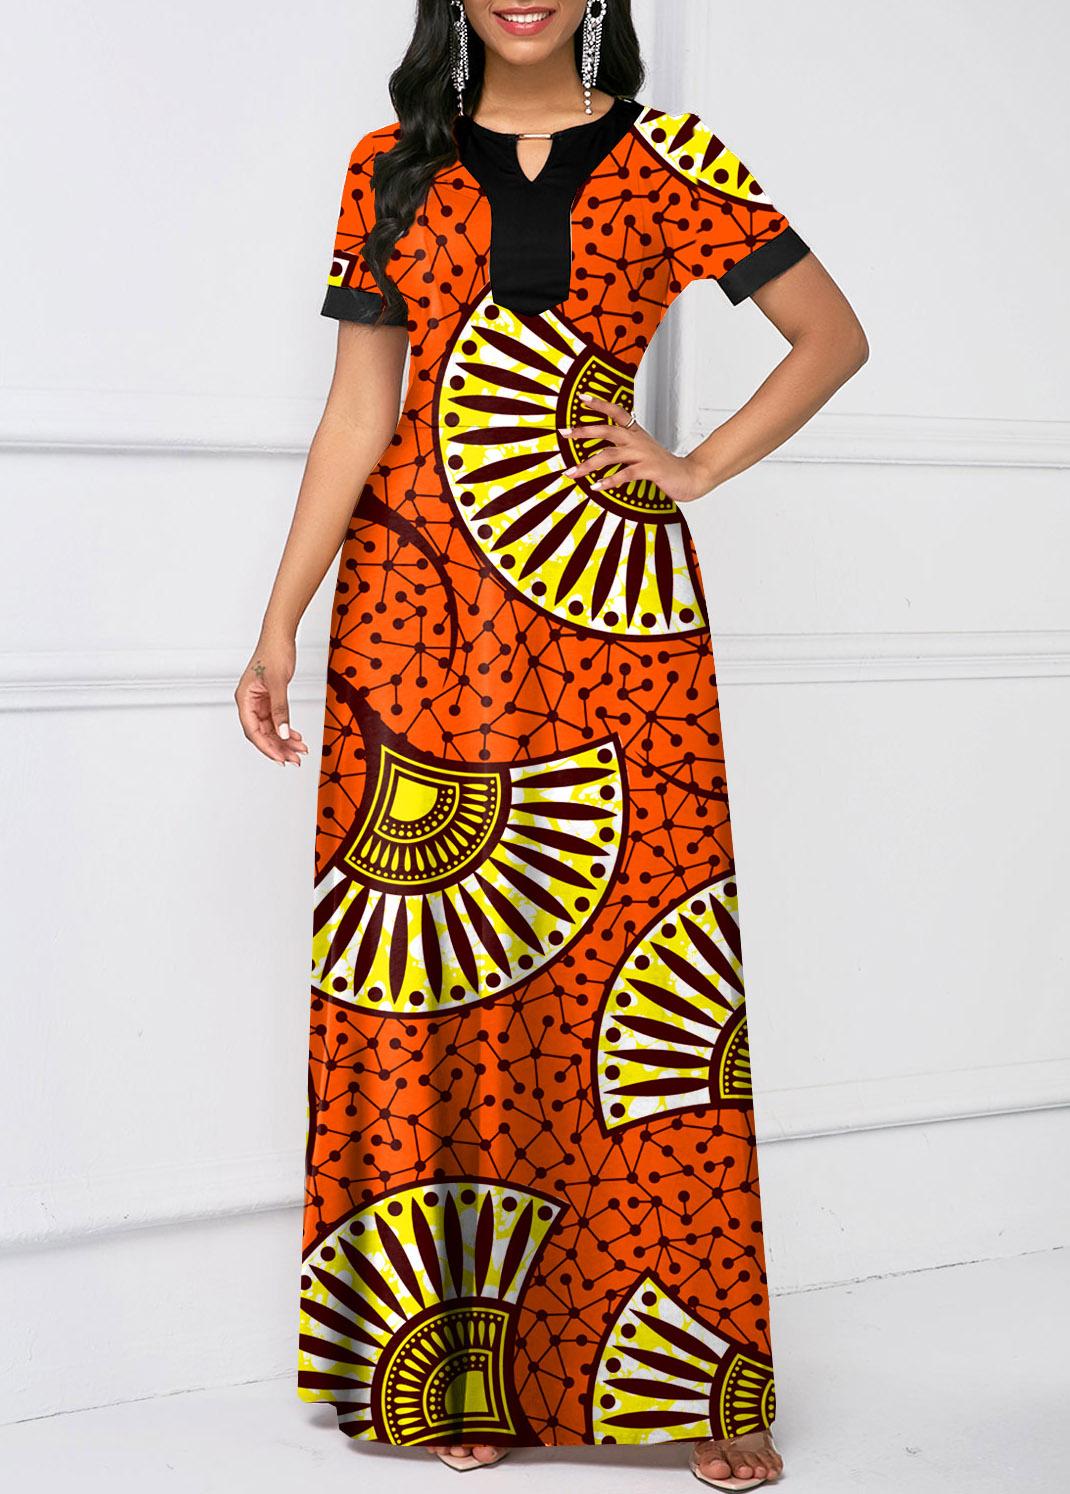 Short Sleeve Tribal Print Keyhole Neckline Dress